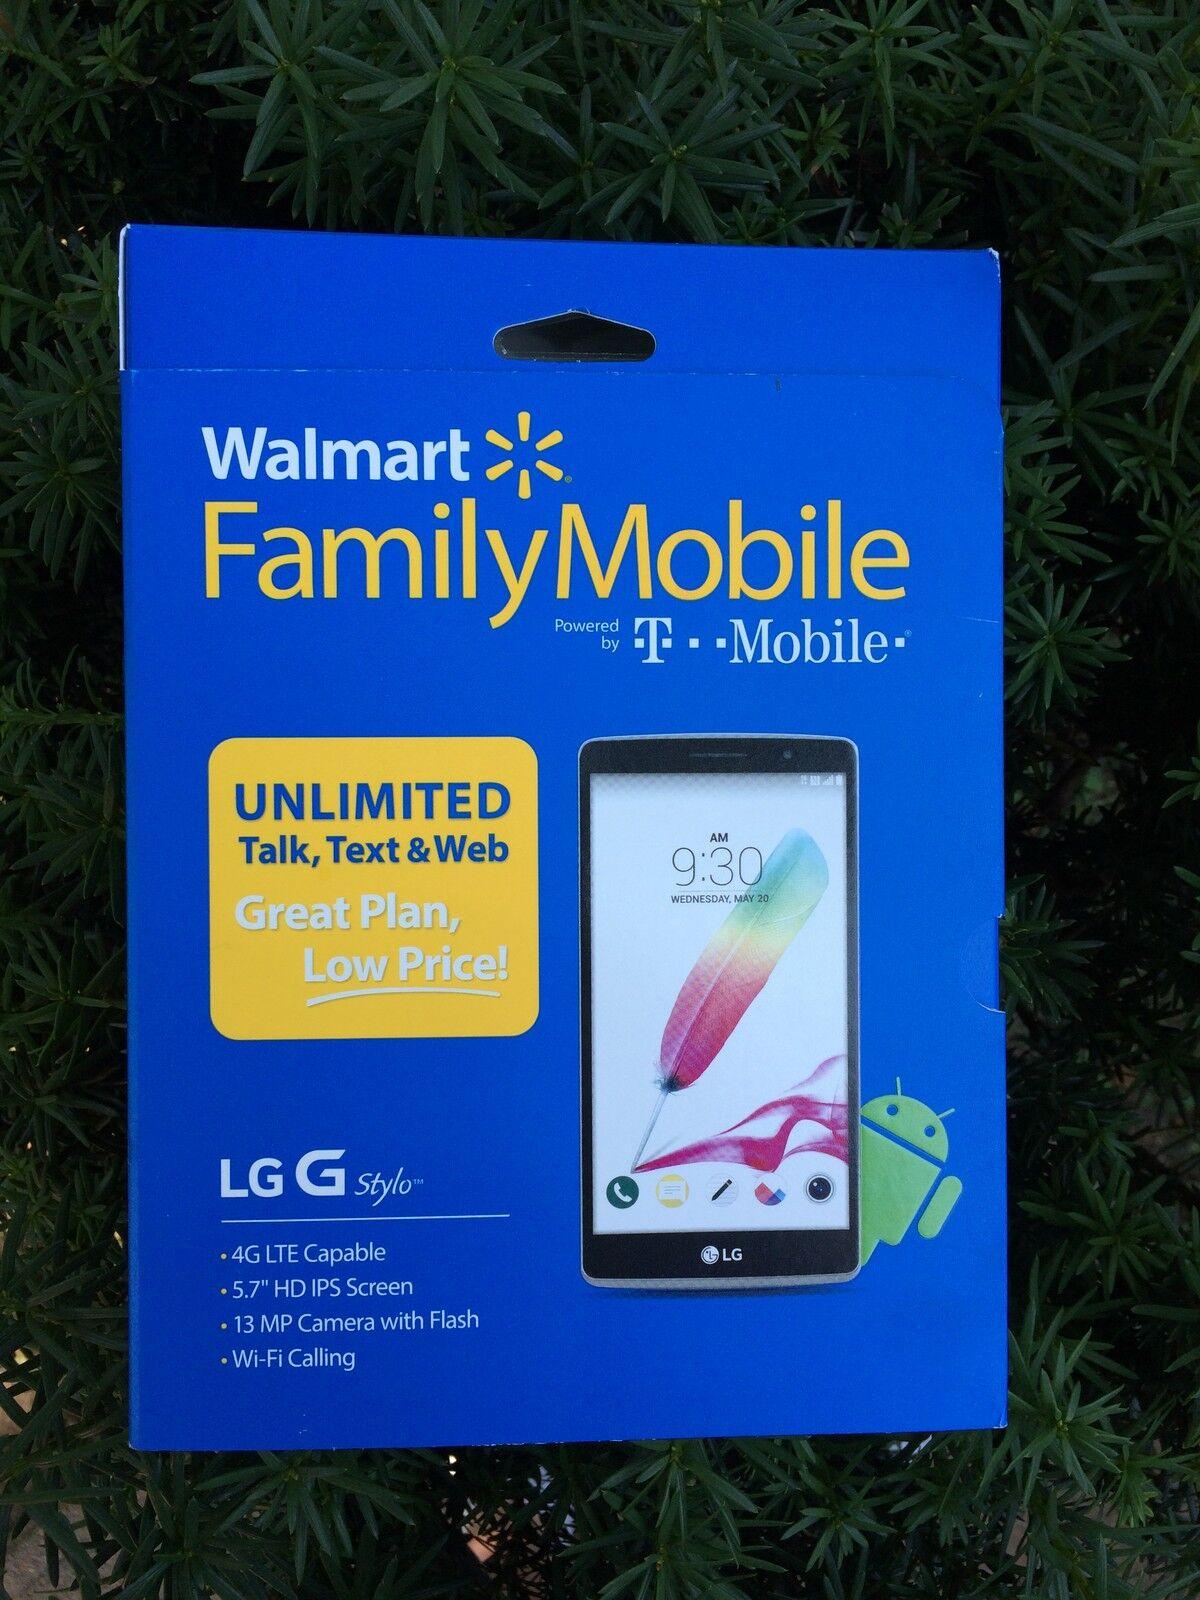 Walmart Family Mobile LG G Stylo Prepaid Smartphone